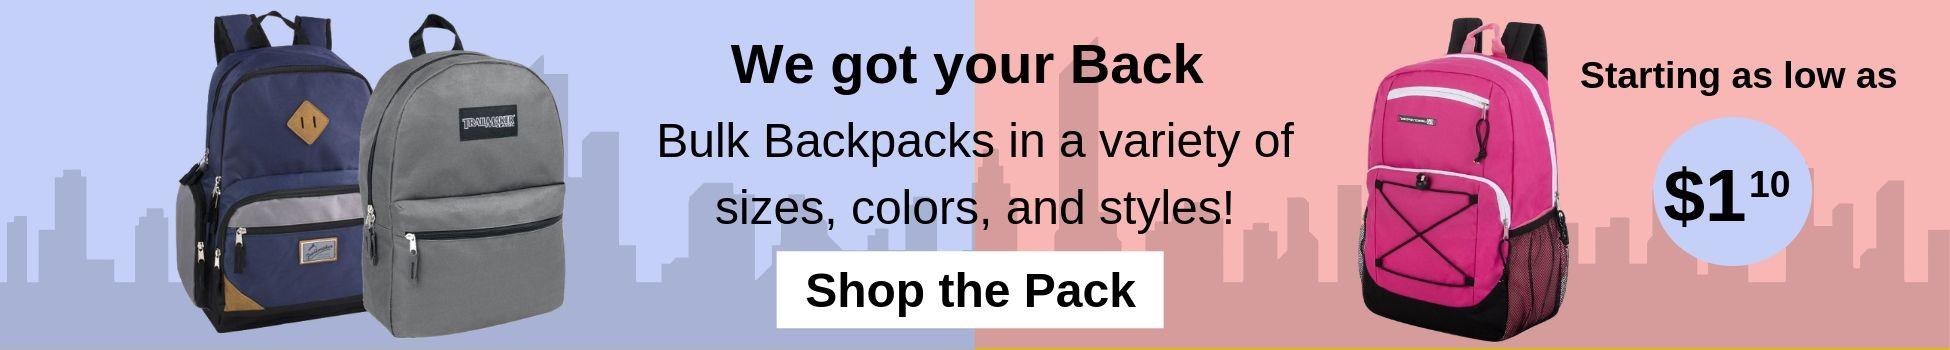 Wholesale Backpacks, bulk backpacks